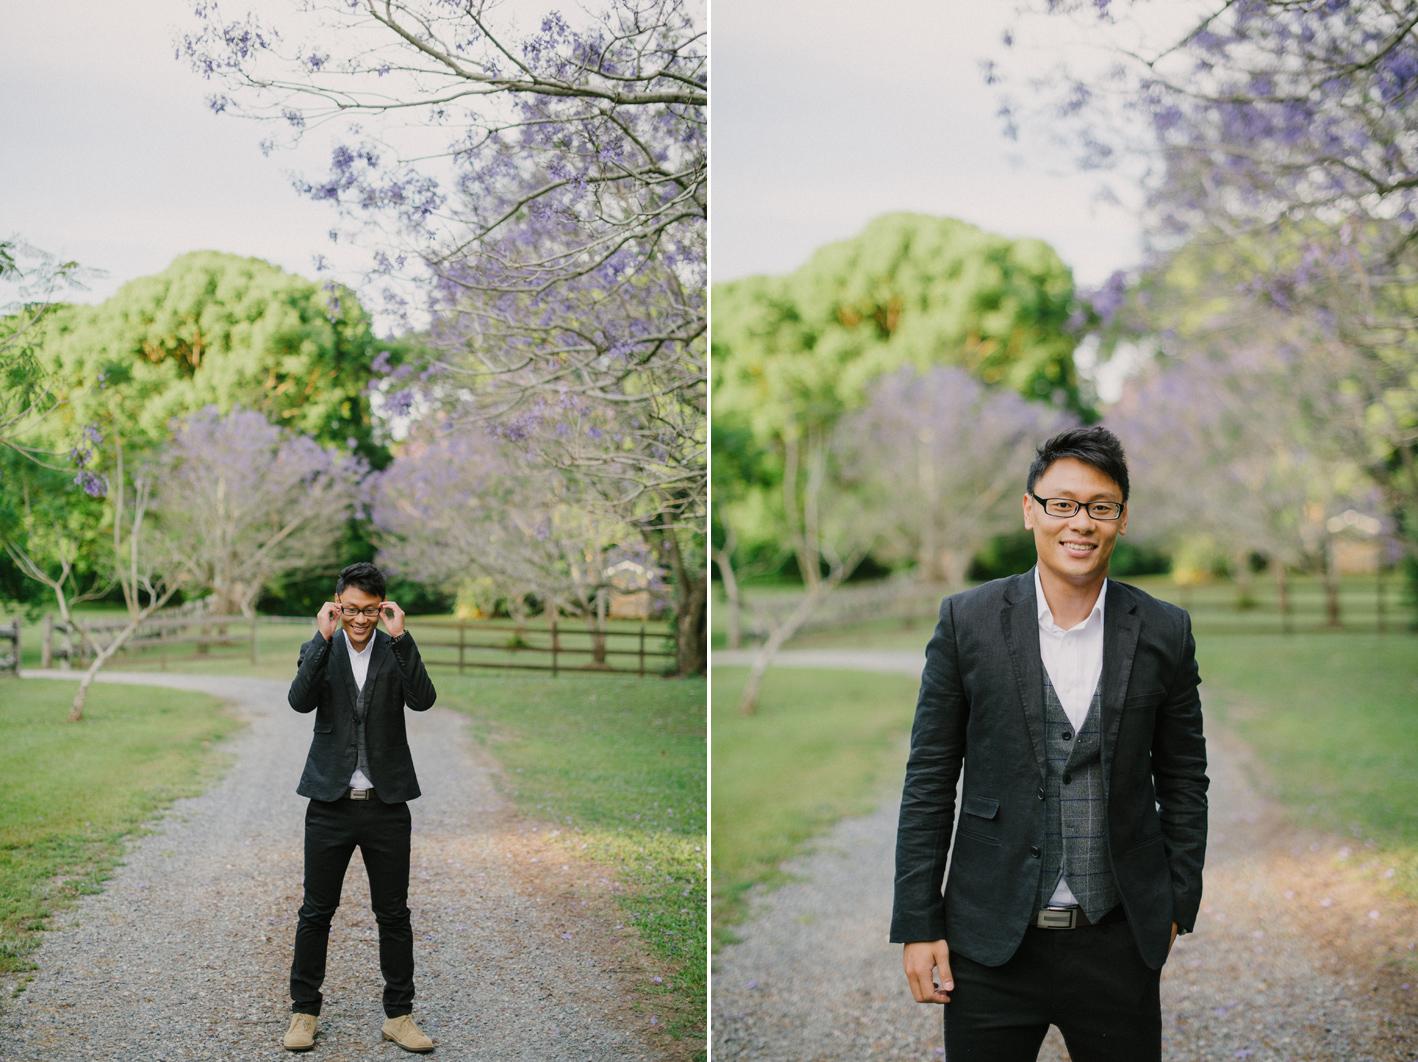 014-ed-janet-currumbin-wedding_sophie-baker-photography